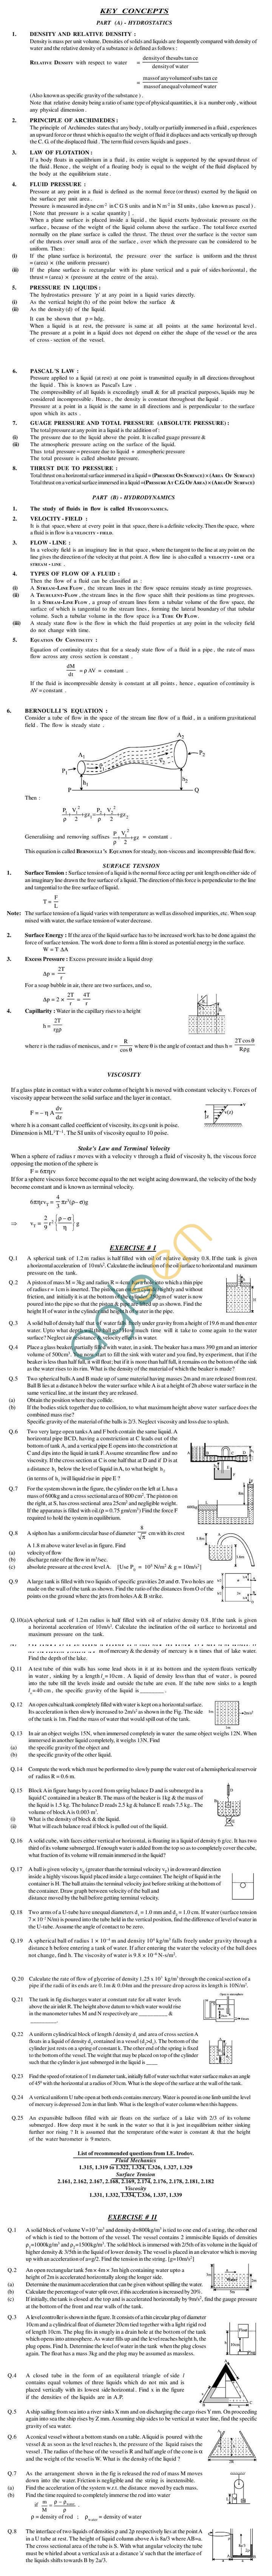 Physics Study Material - Fluid Mechanics